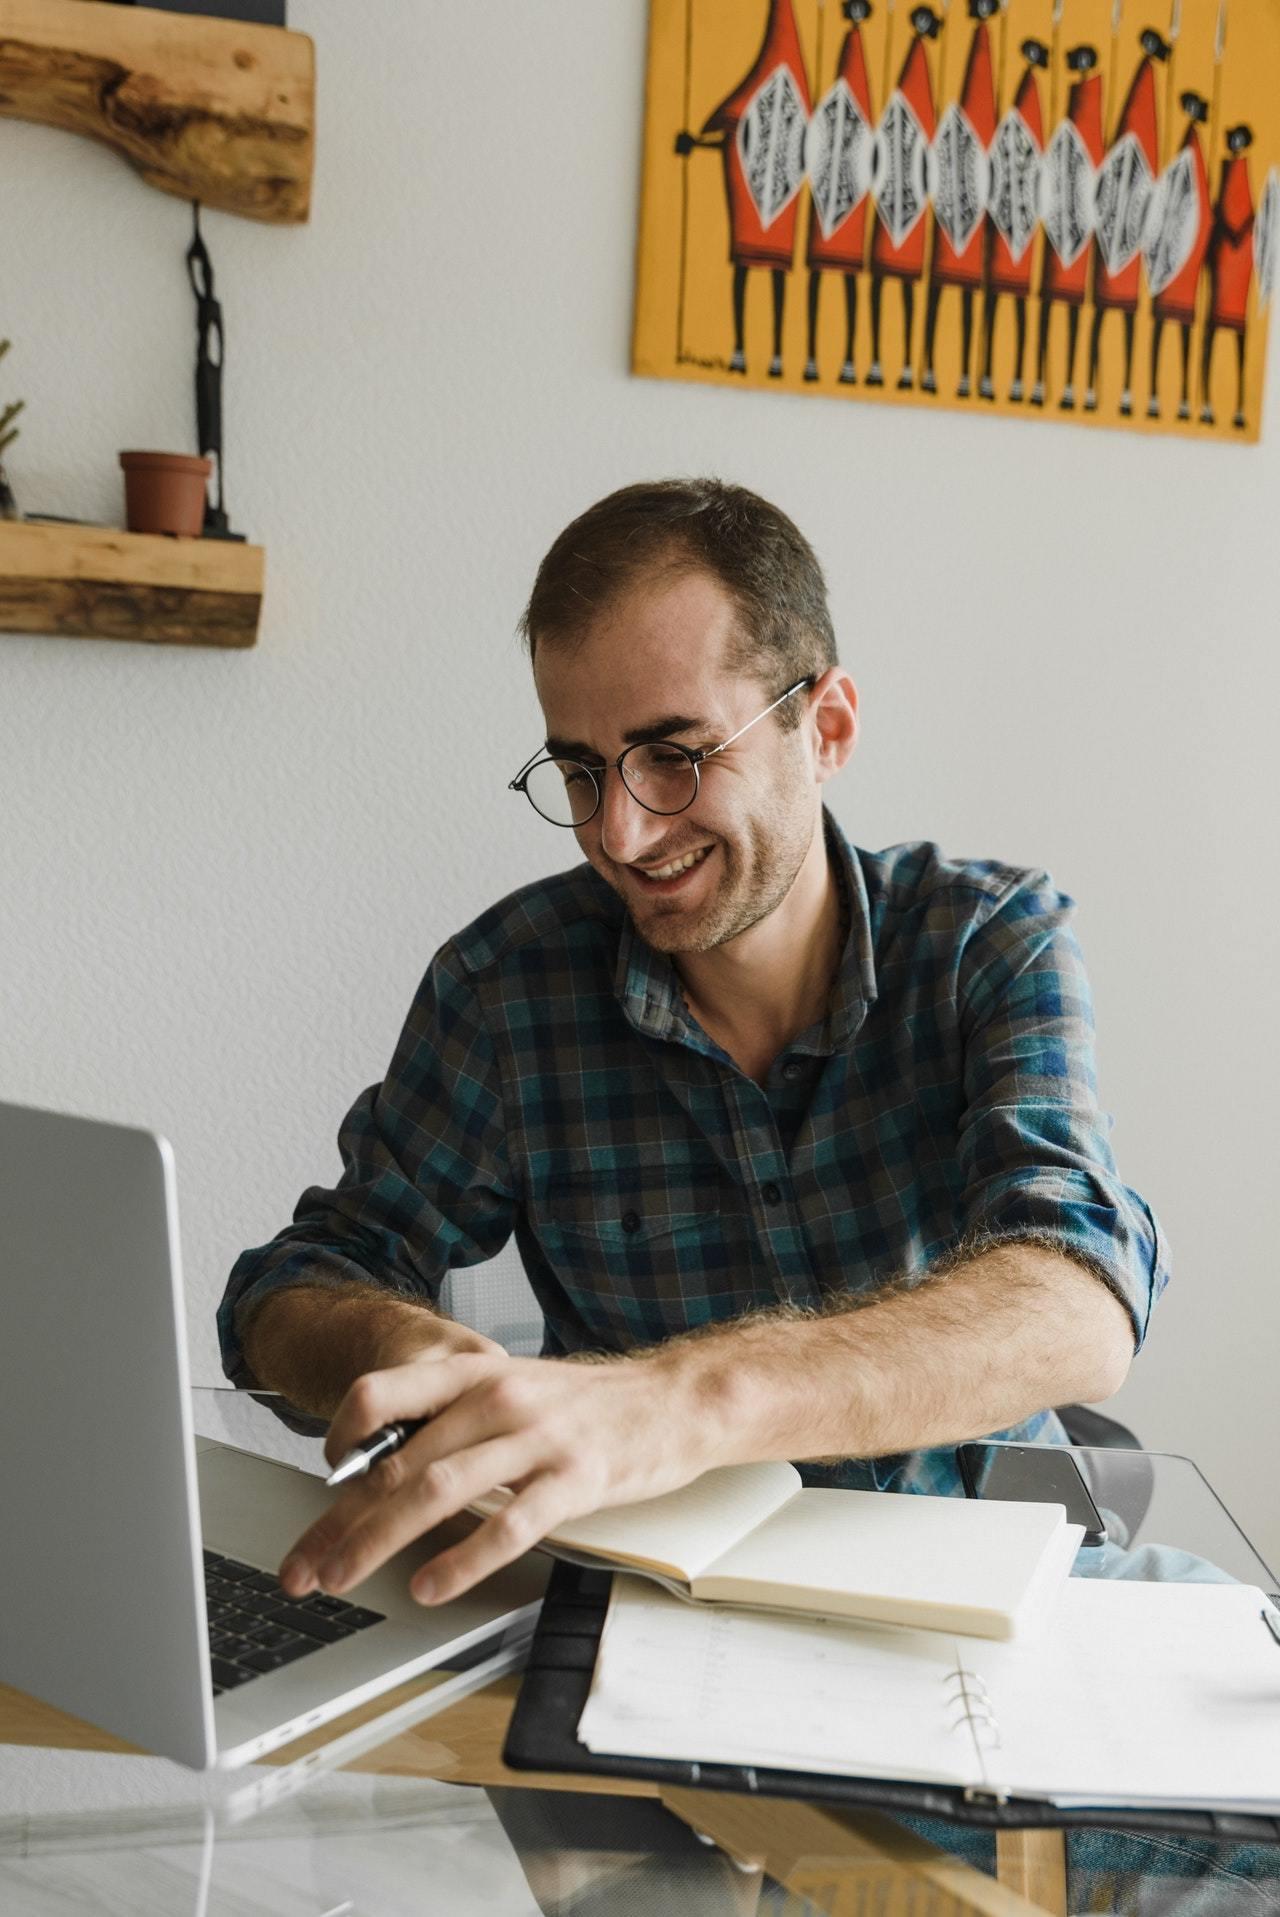 Blogger Influencer